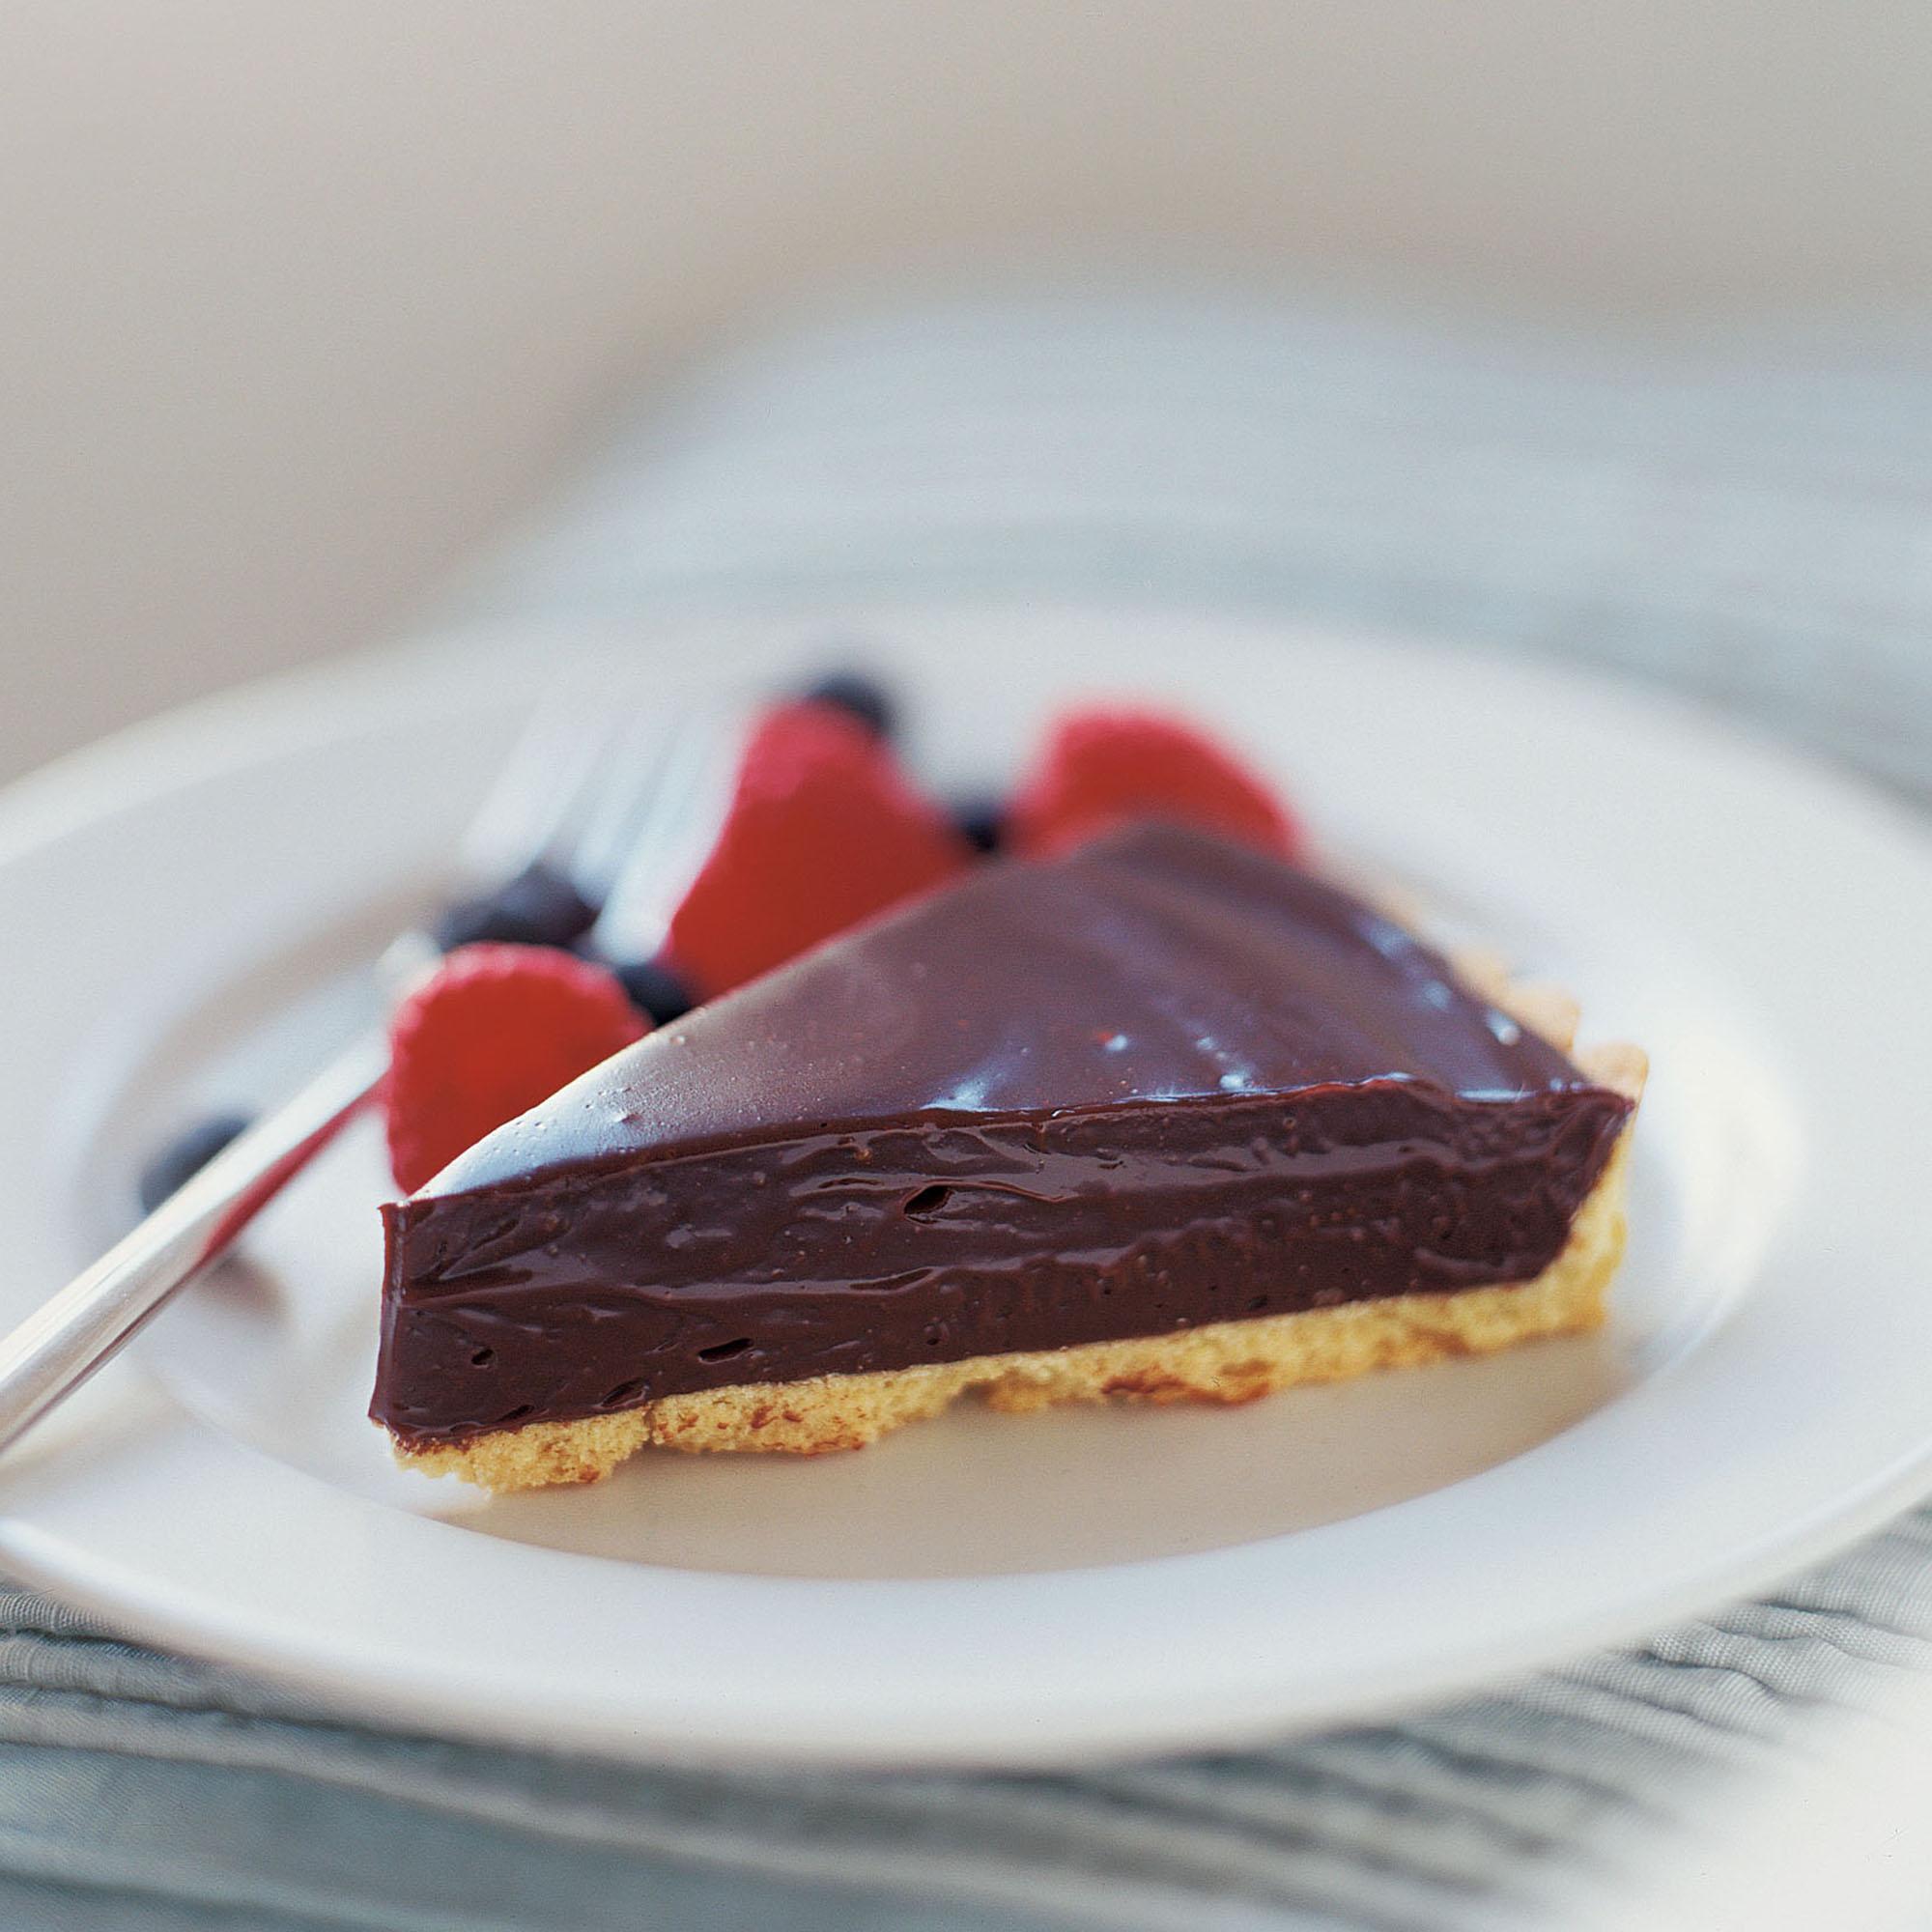 No Cook Chocolate Tart Dessert Recipes Woman Home